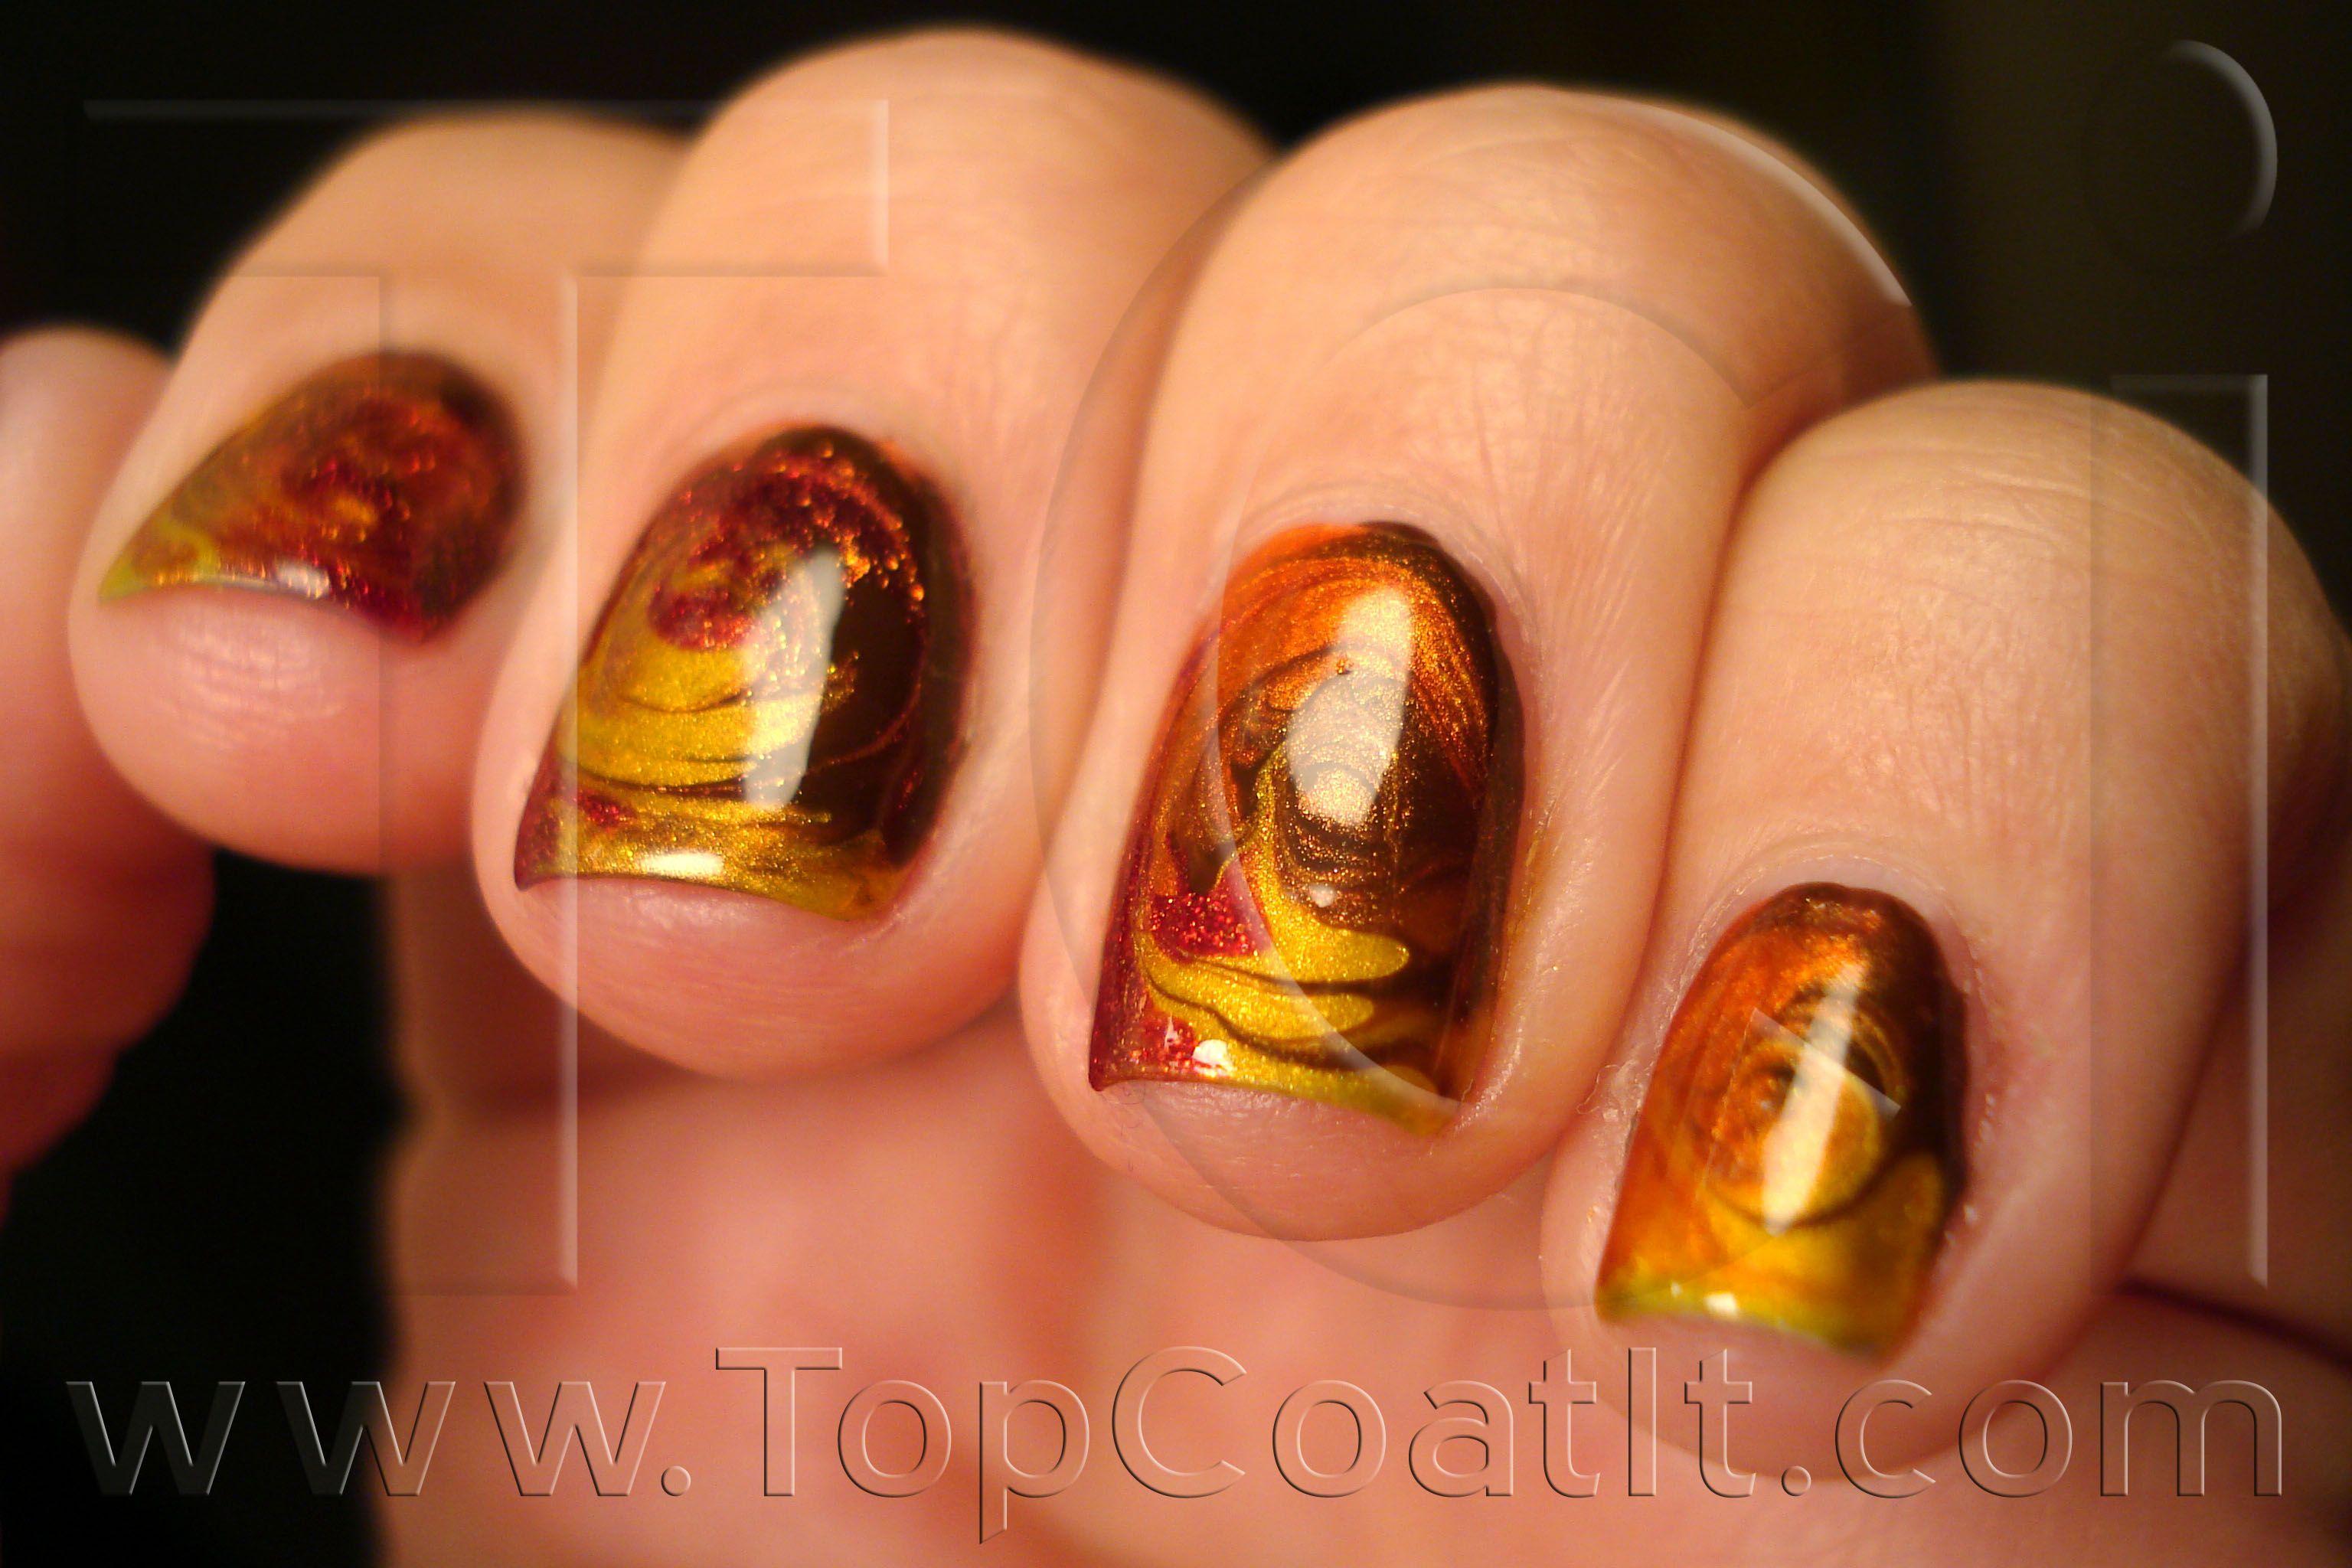 fall nail designs - Google Search   Nails   Pinterest   Marbles ...